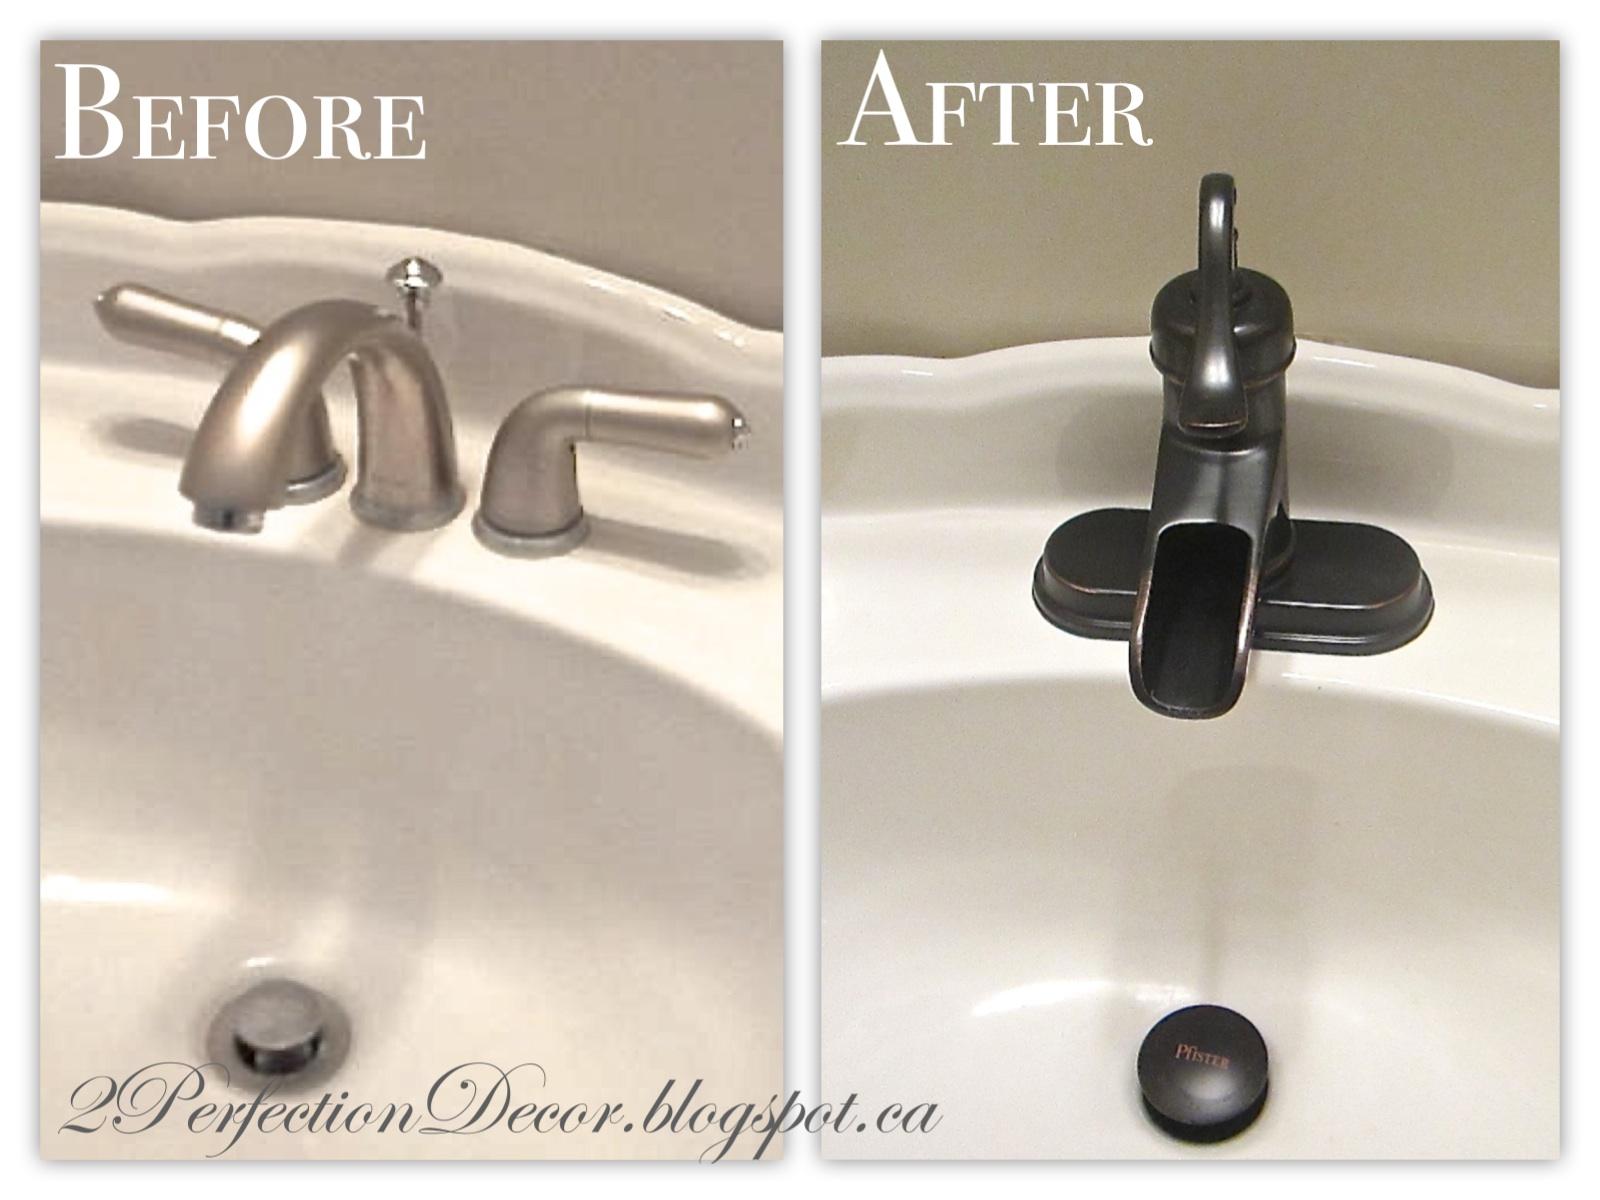 2perfection Decor Basement Coastal Bathroom Reveal: 2Perfection Decor: Powder Bath Updates